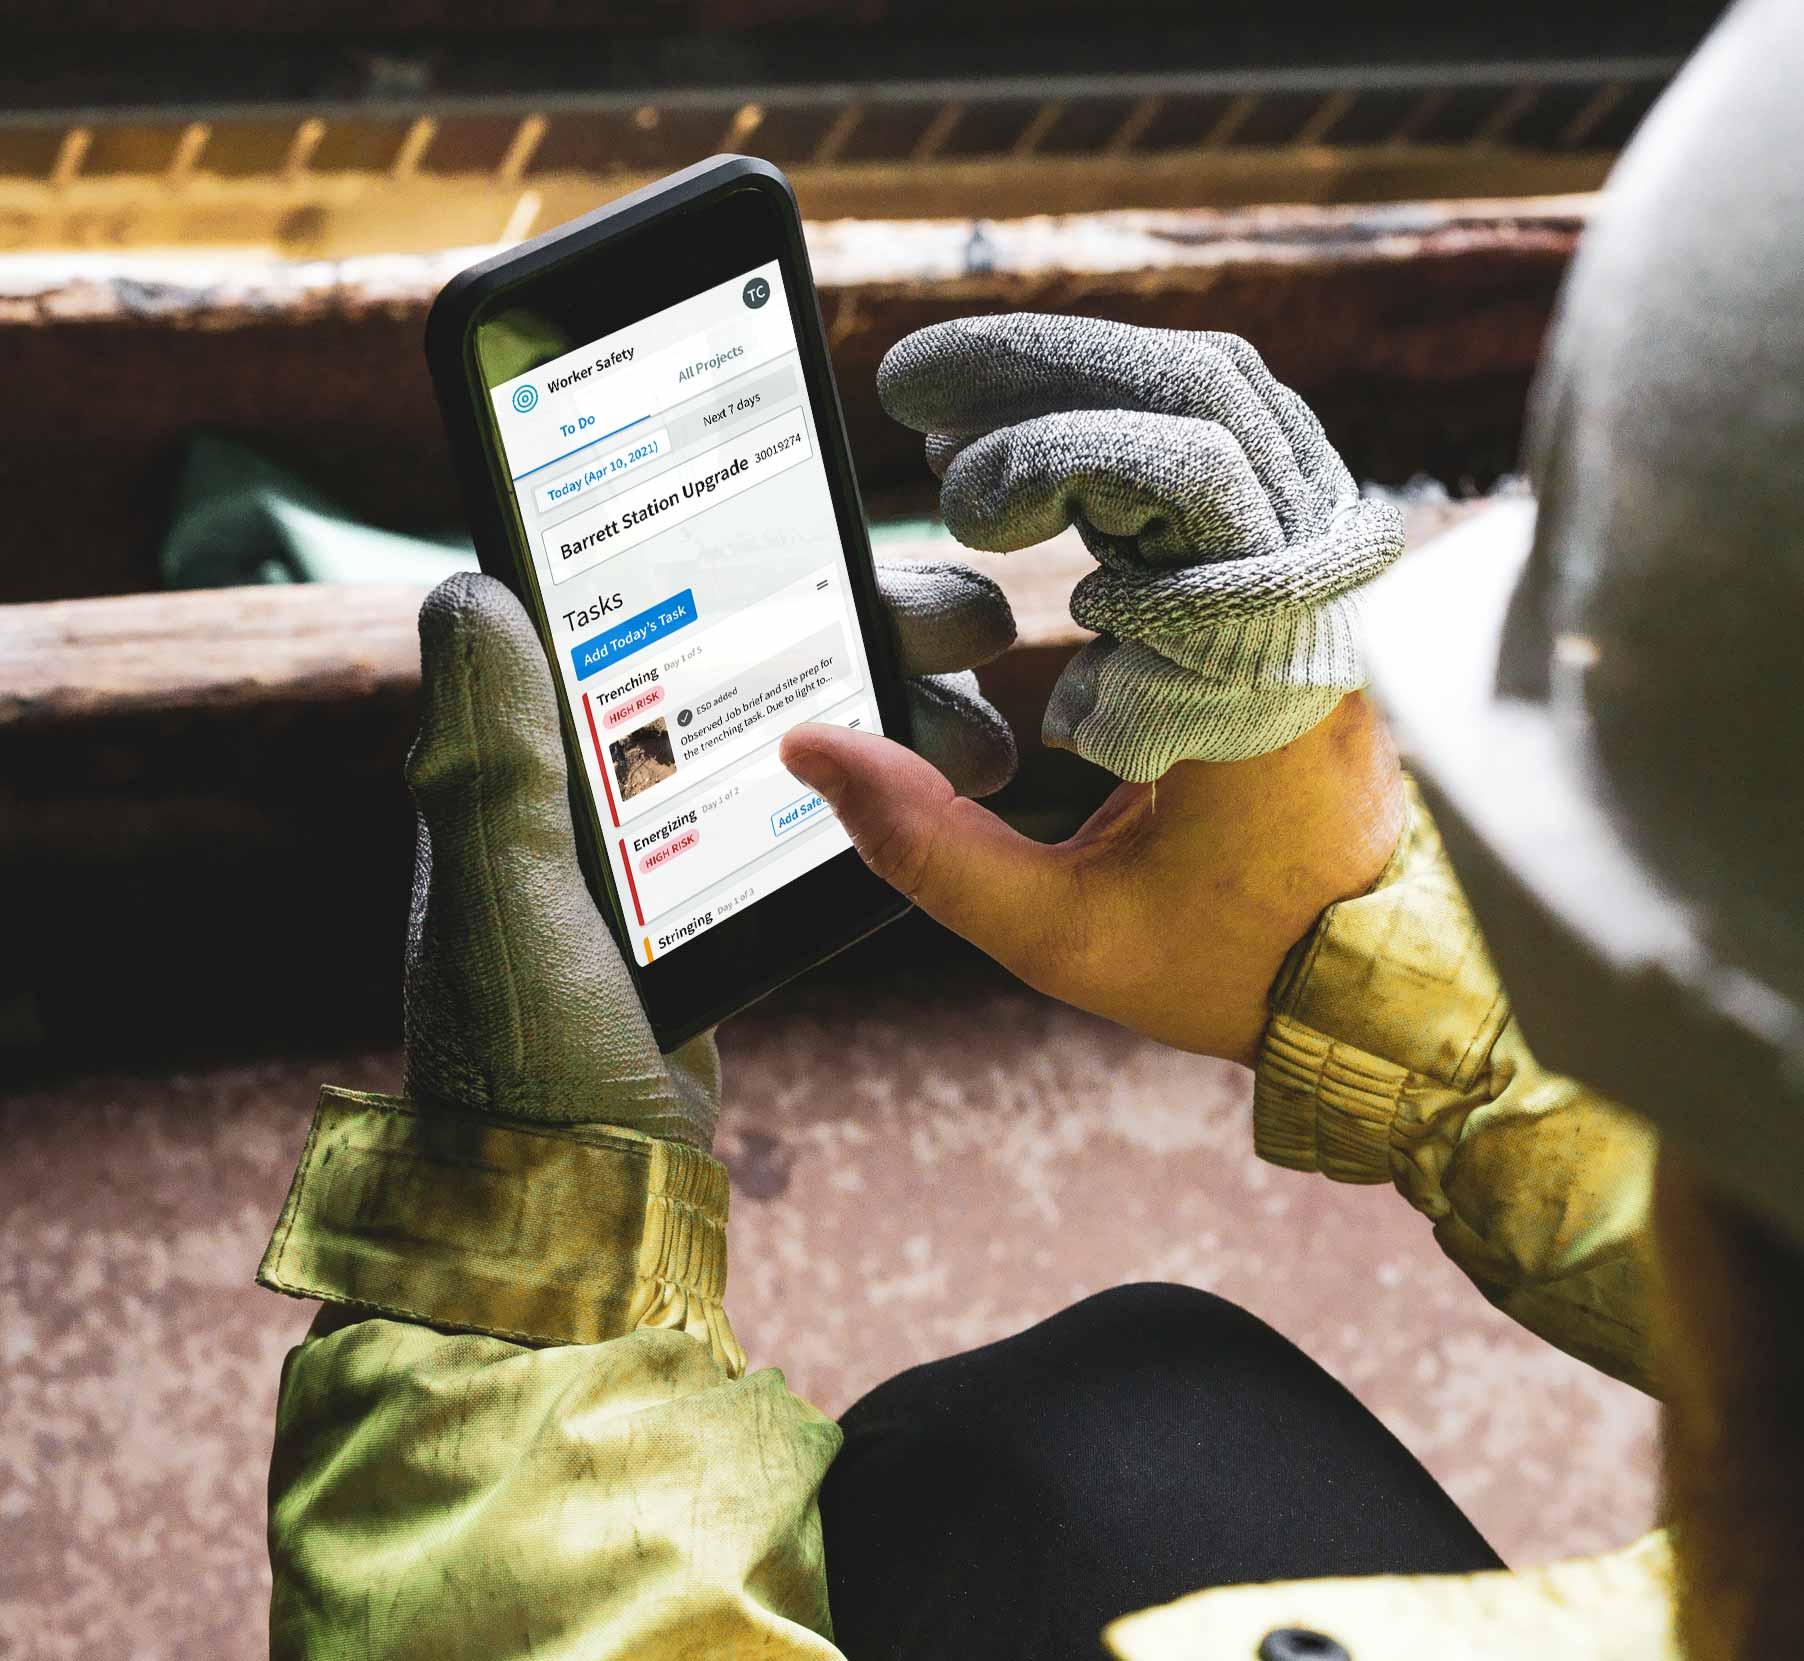 supervisor-iphone-urbint-lens-worker-safety